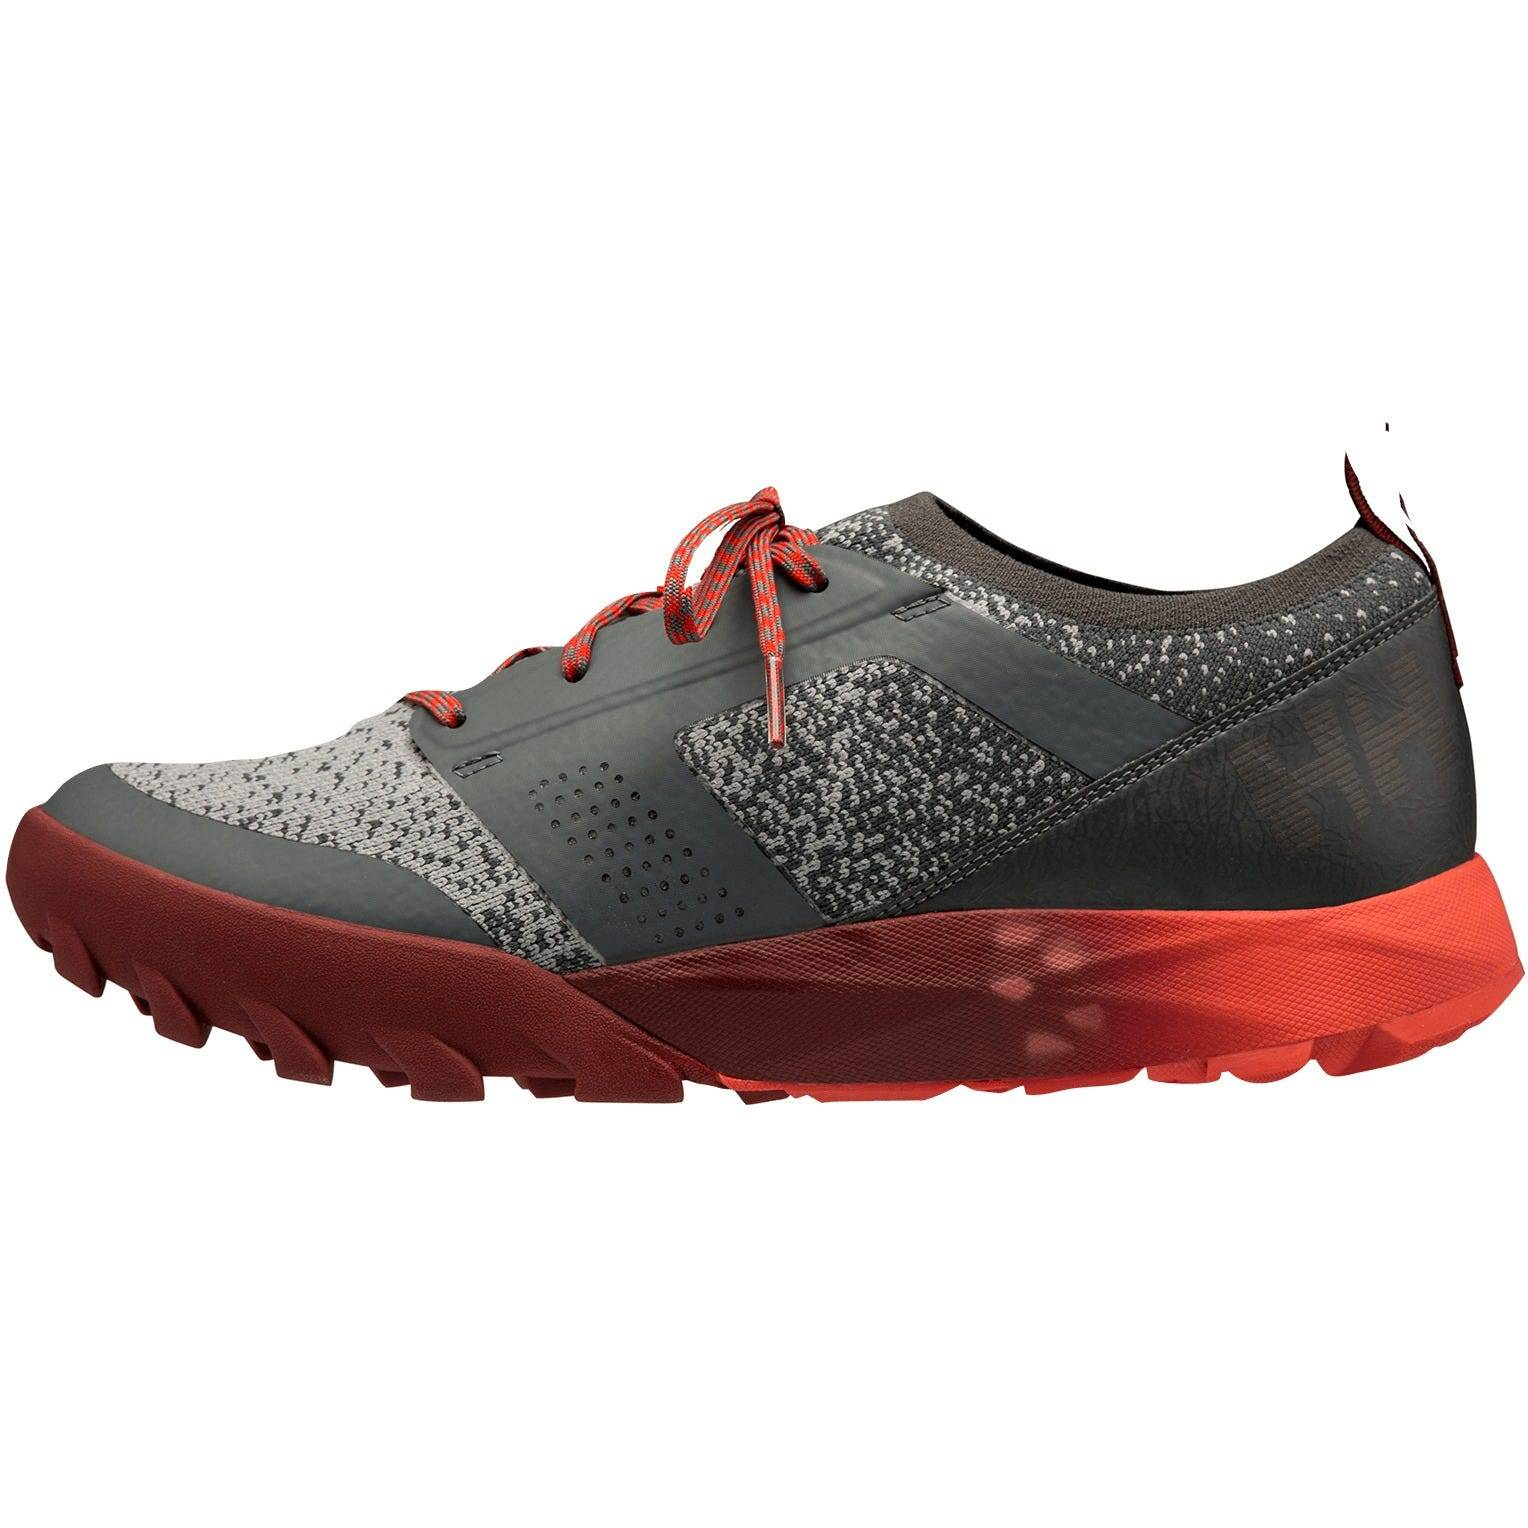 Helly Hansen Loke Dash Mens Hiking Boot Blue 42.5/9